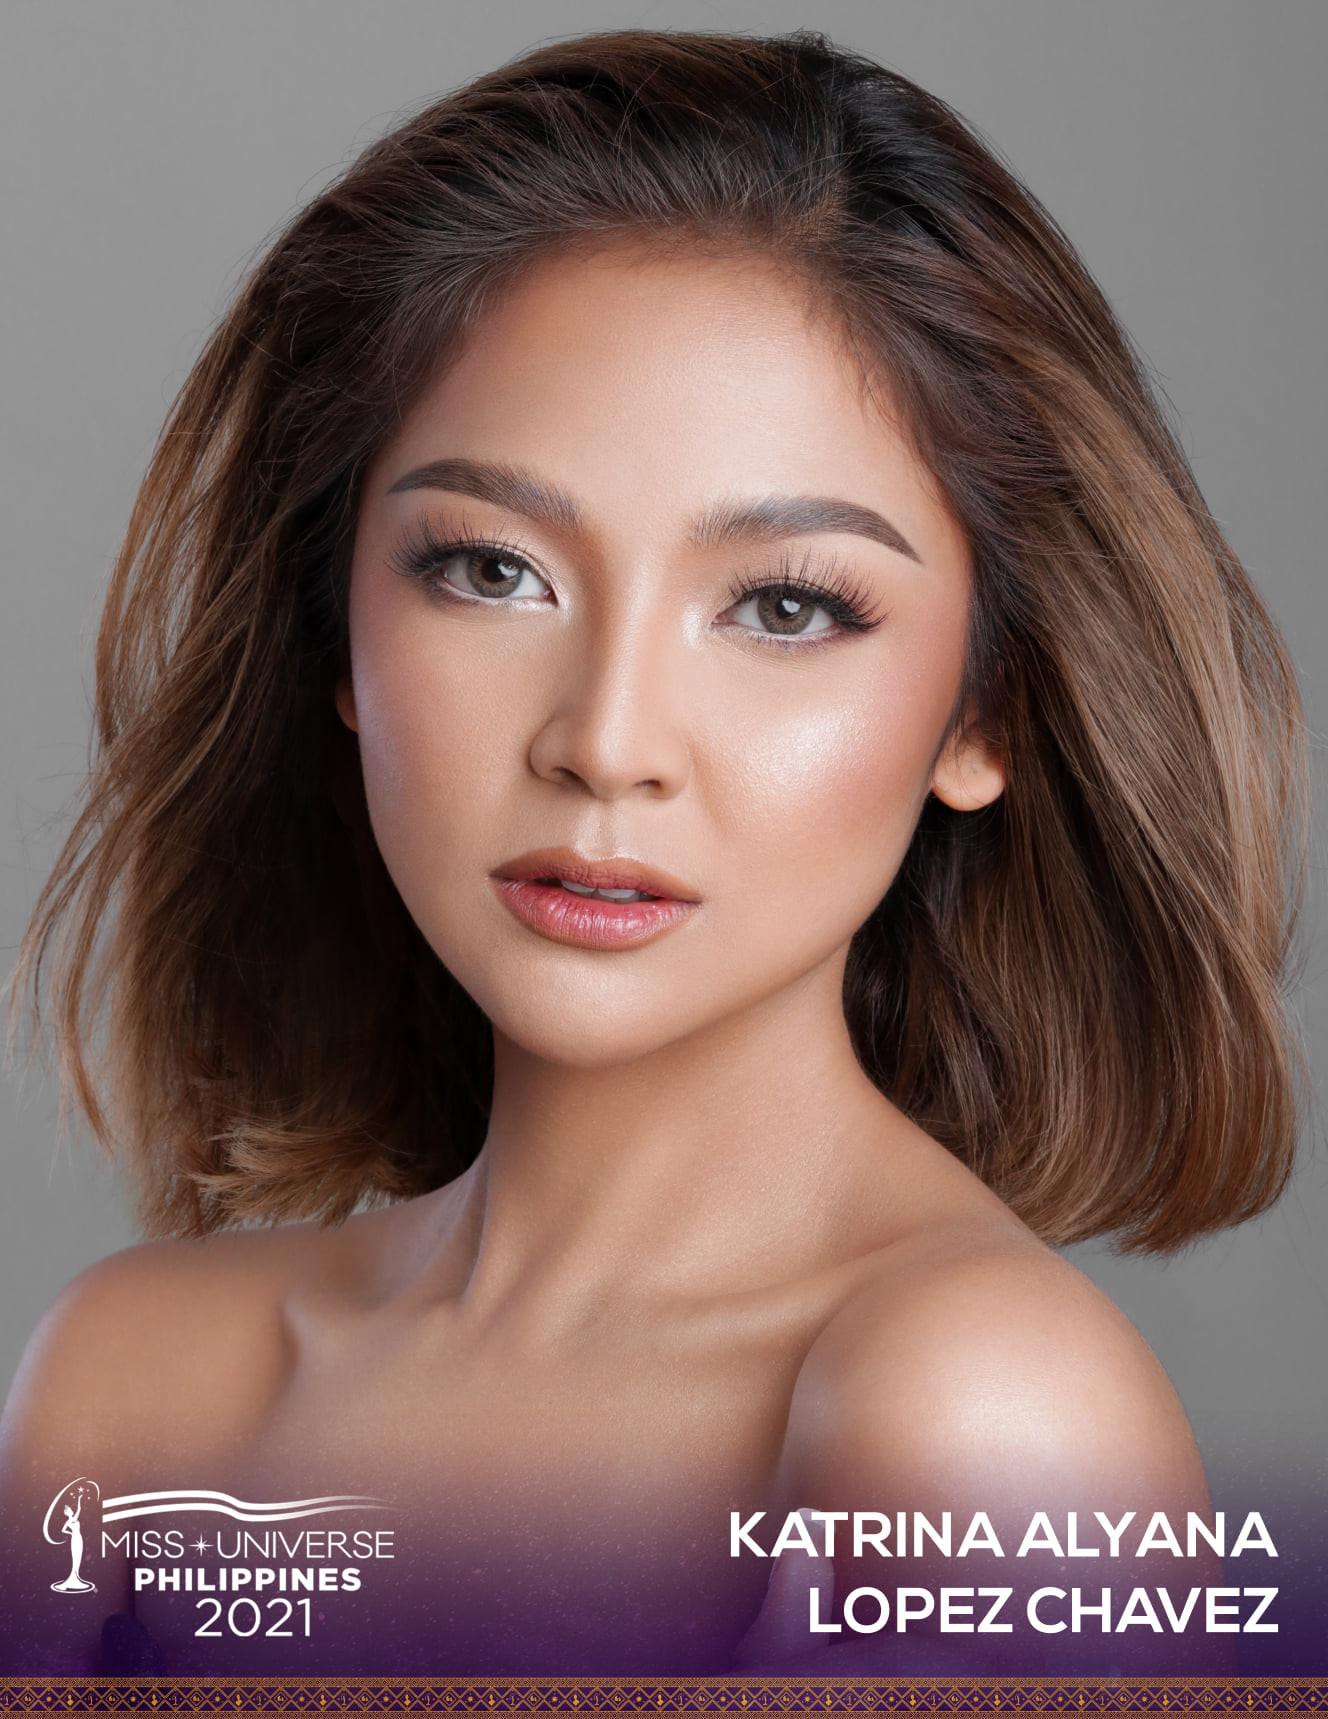 pre-candidatas a miss universe philippines 2021. - Página 3 AlqMwg